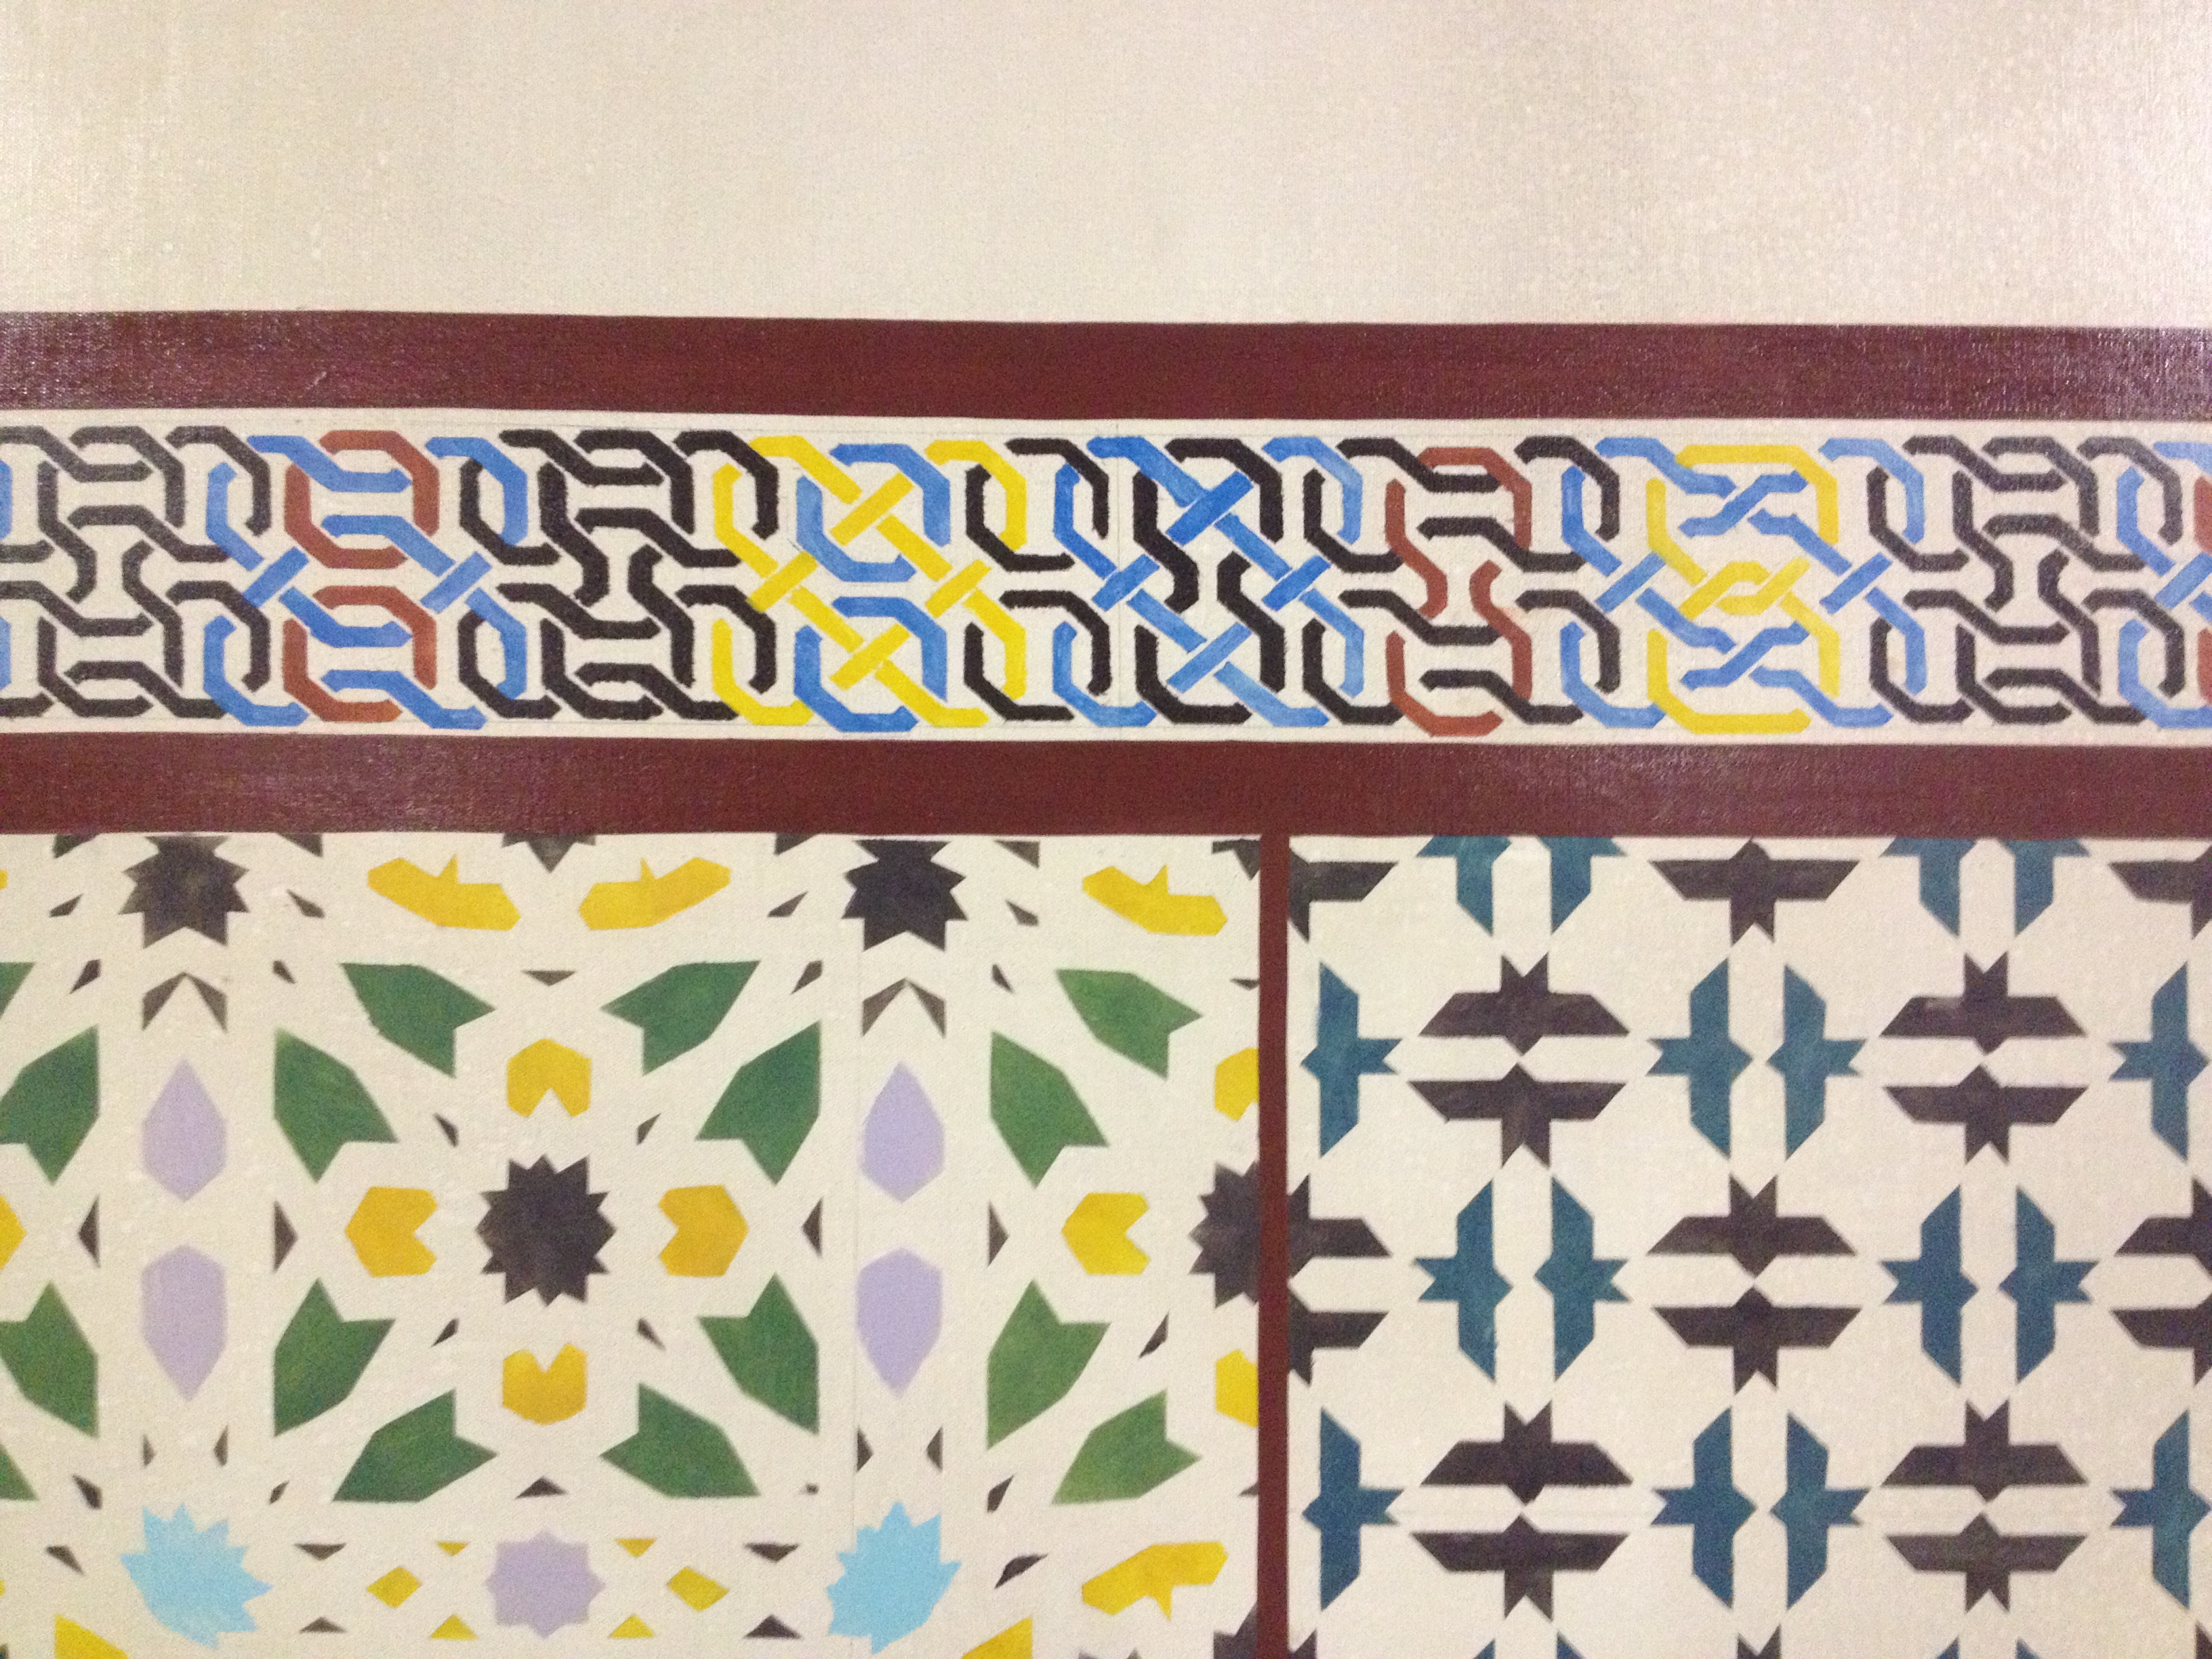 stencil detail